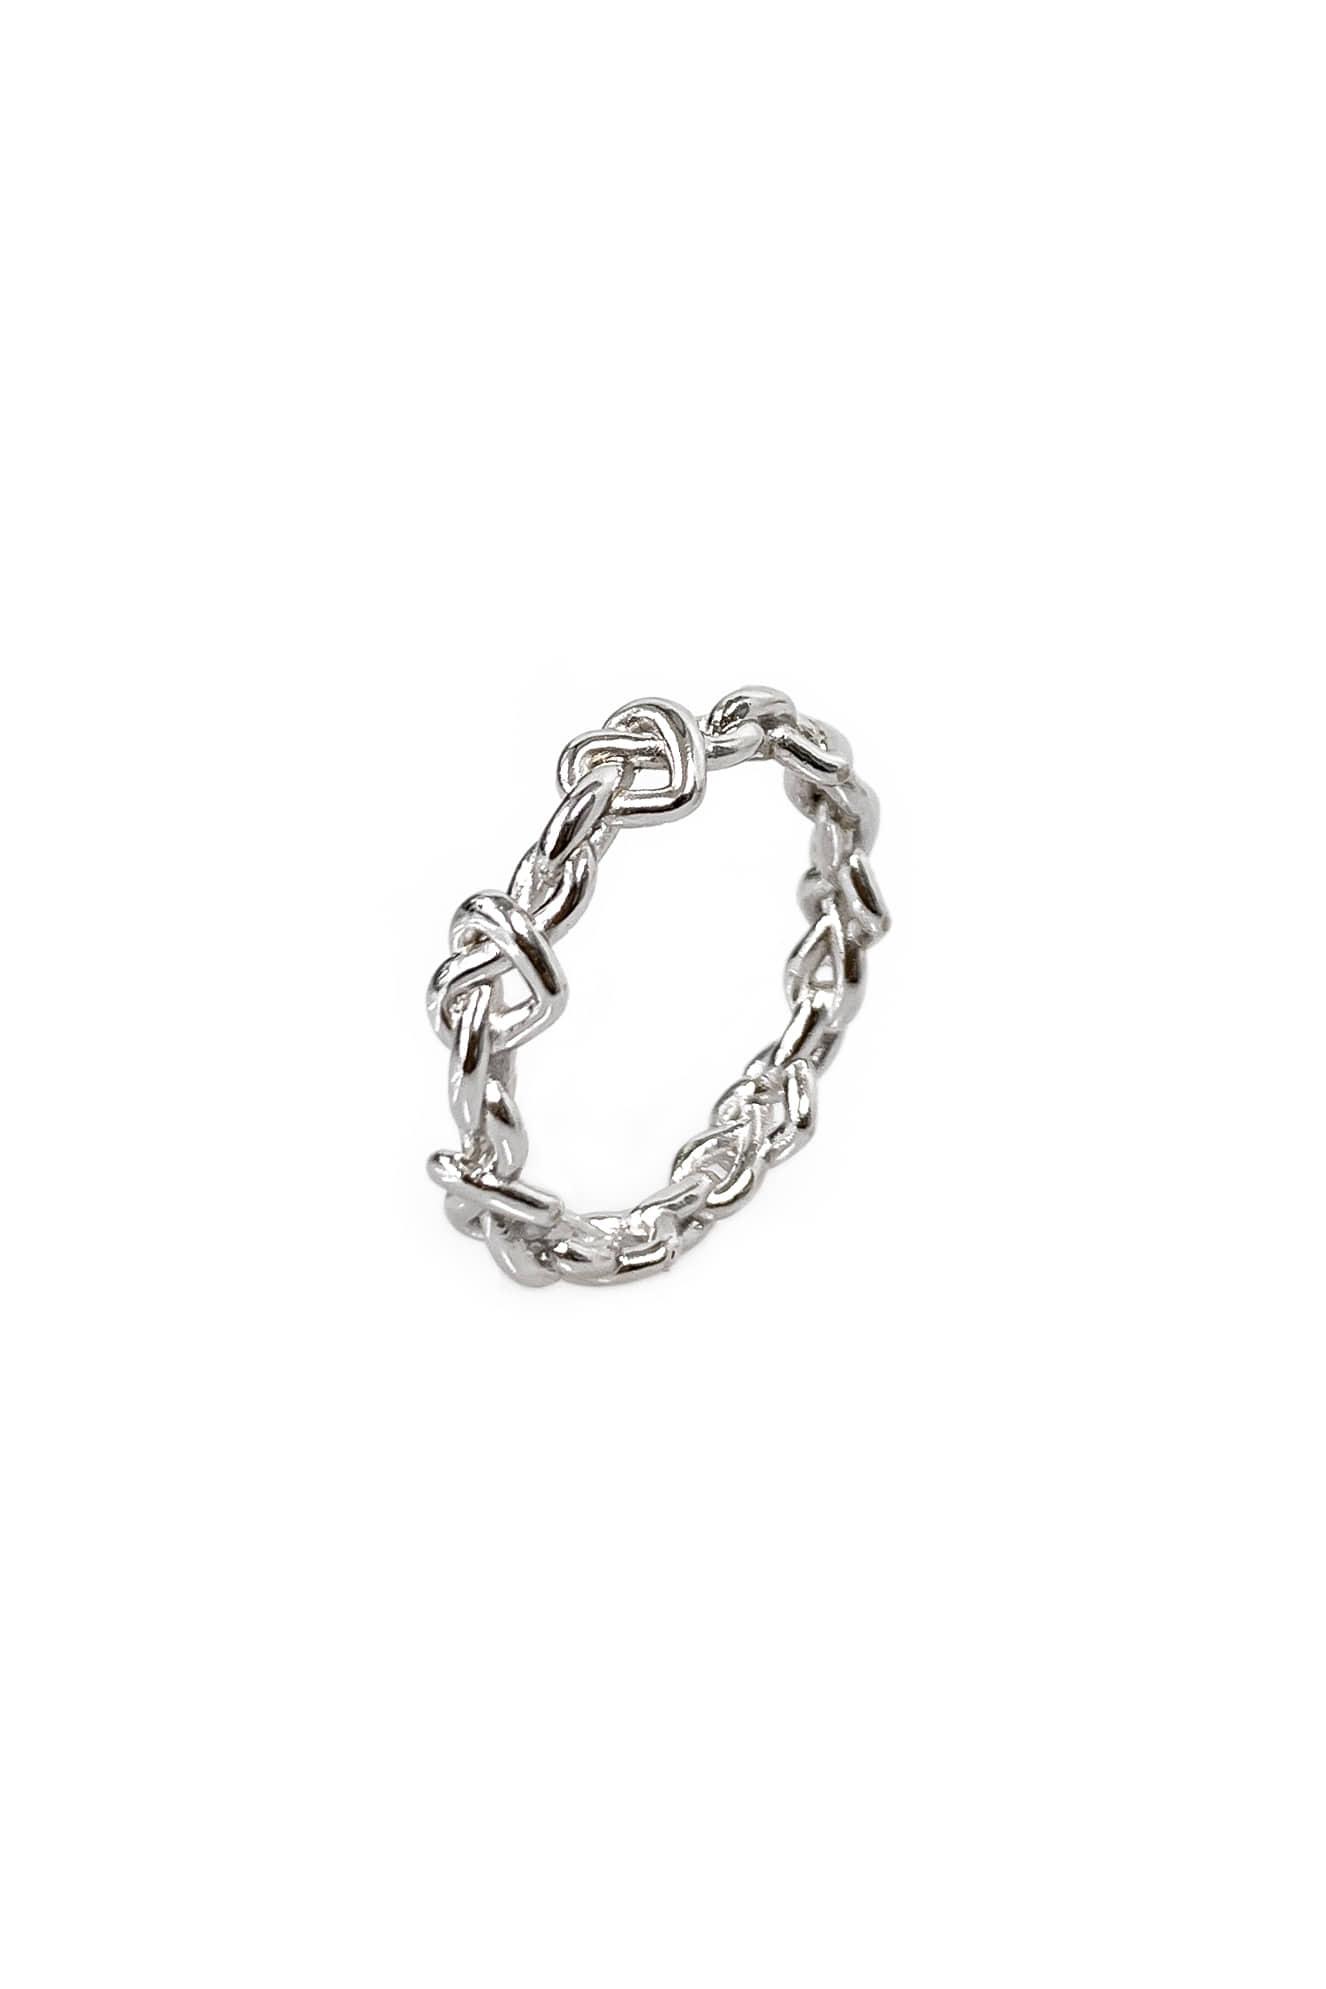 [silver925] 미니 꼬임 하트 반지